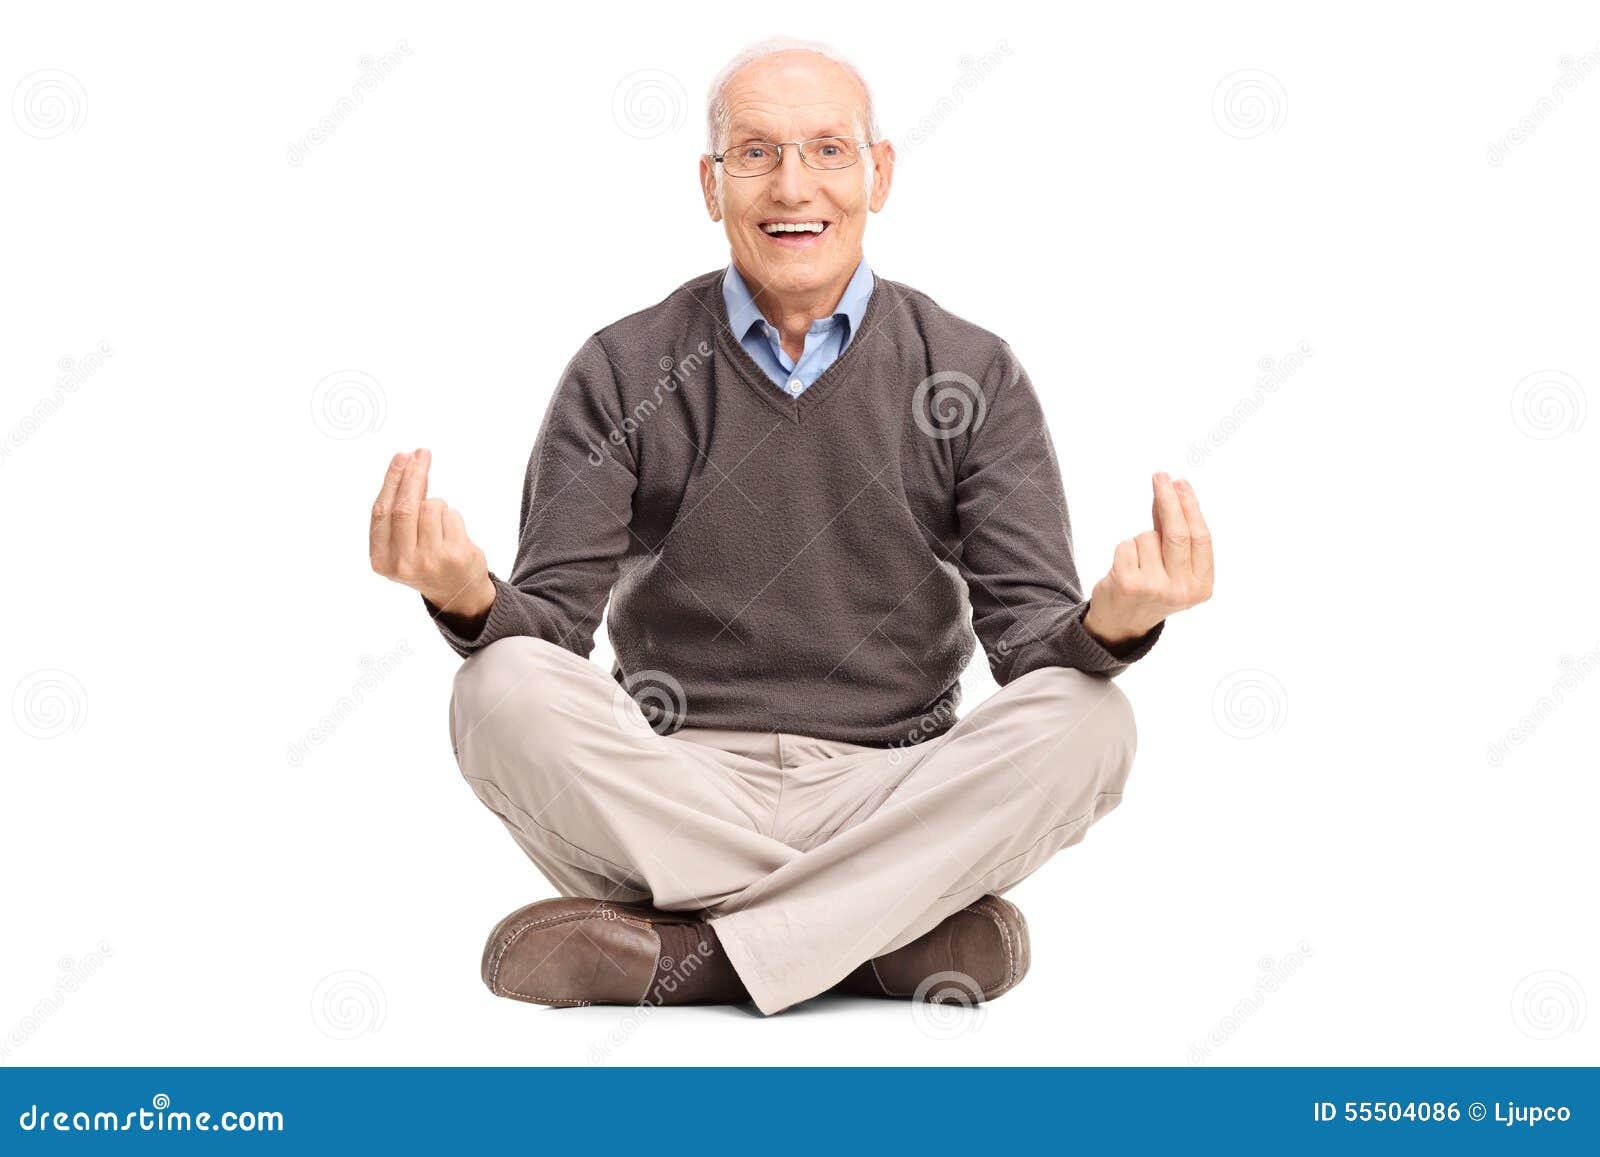 Senior gentleman meditating seated on the floor